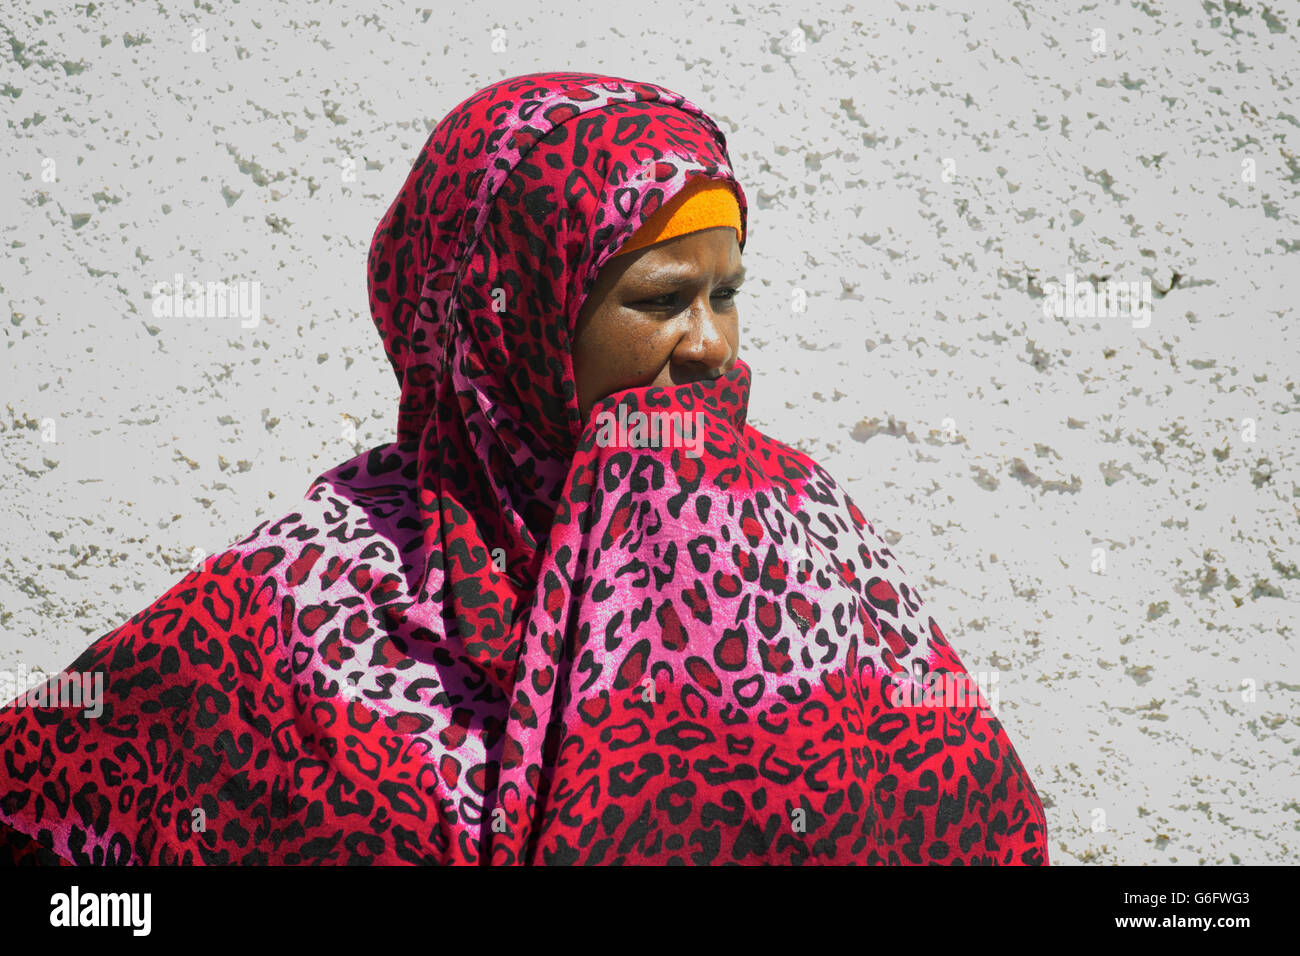 Harari woman in the street in muslim dress. Harar, Ethiopia - Stock Image